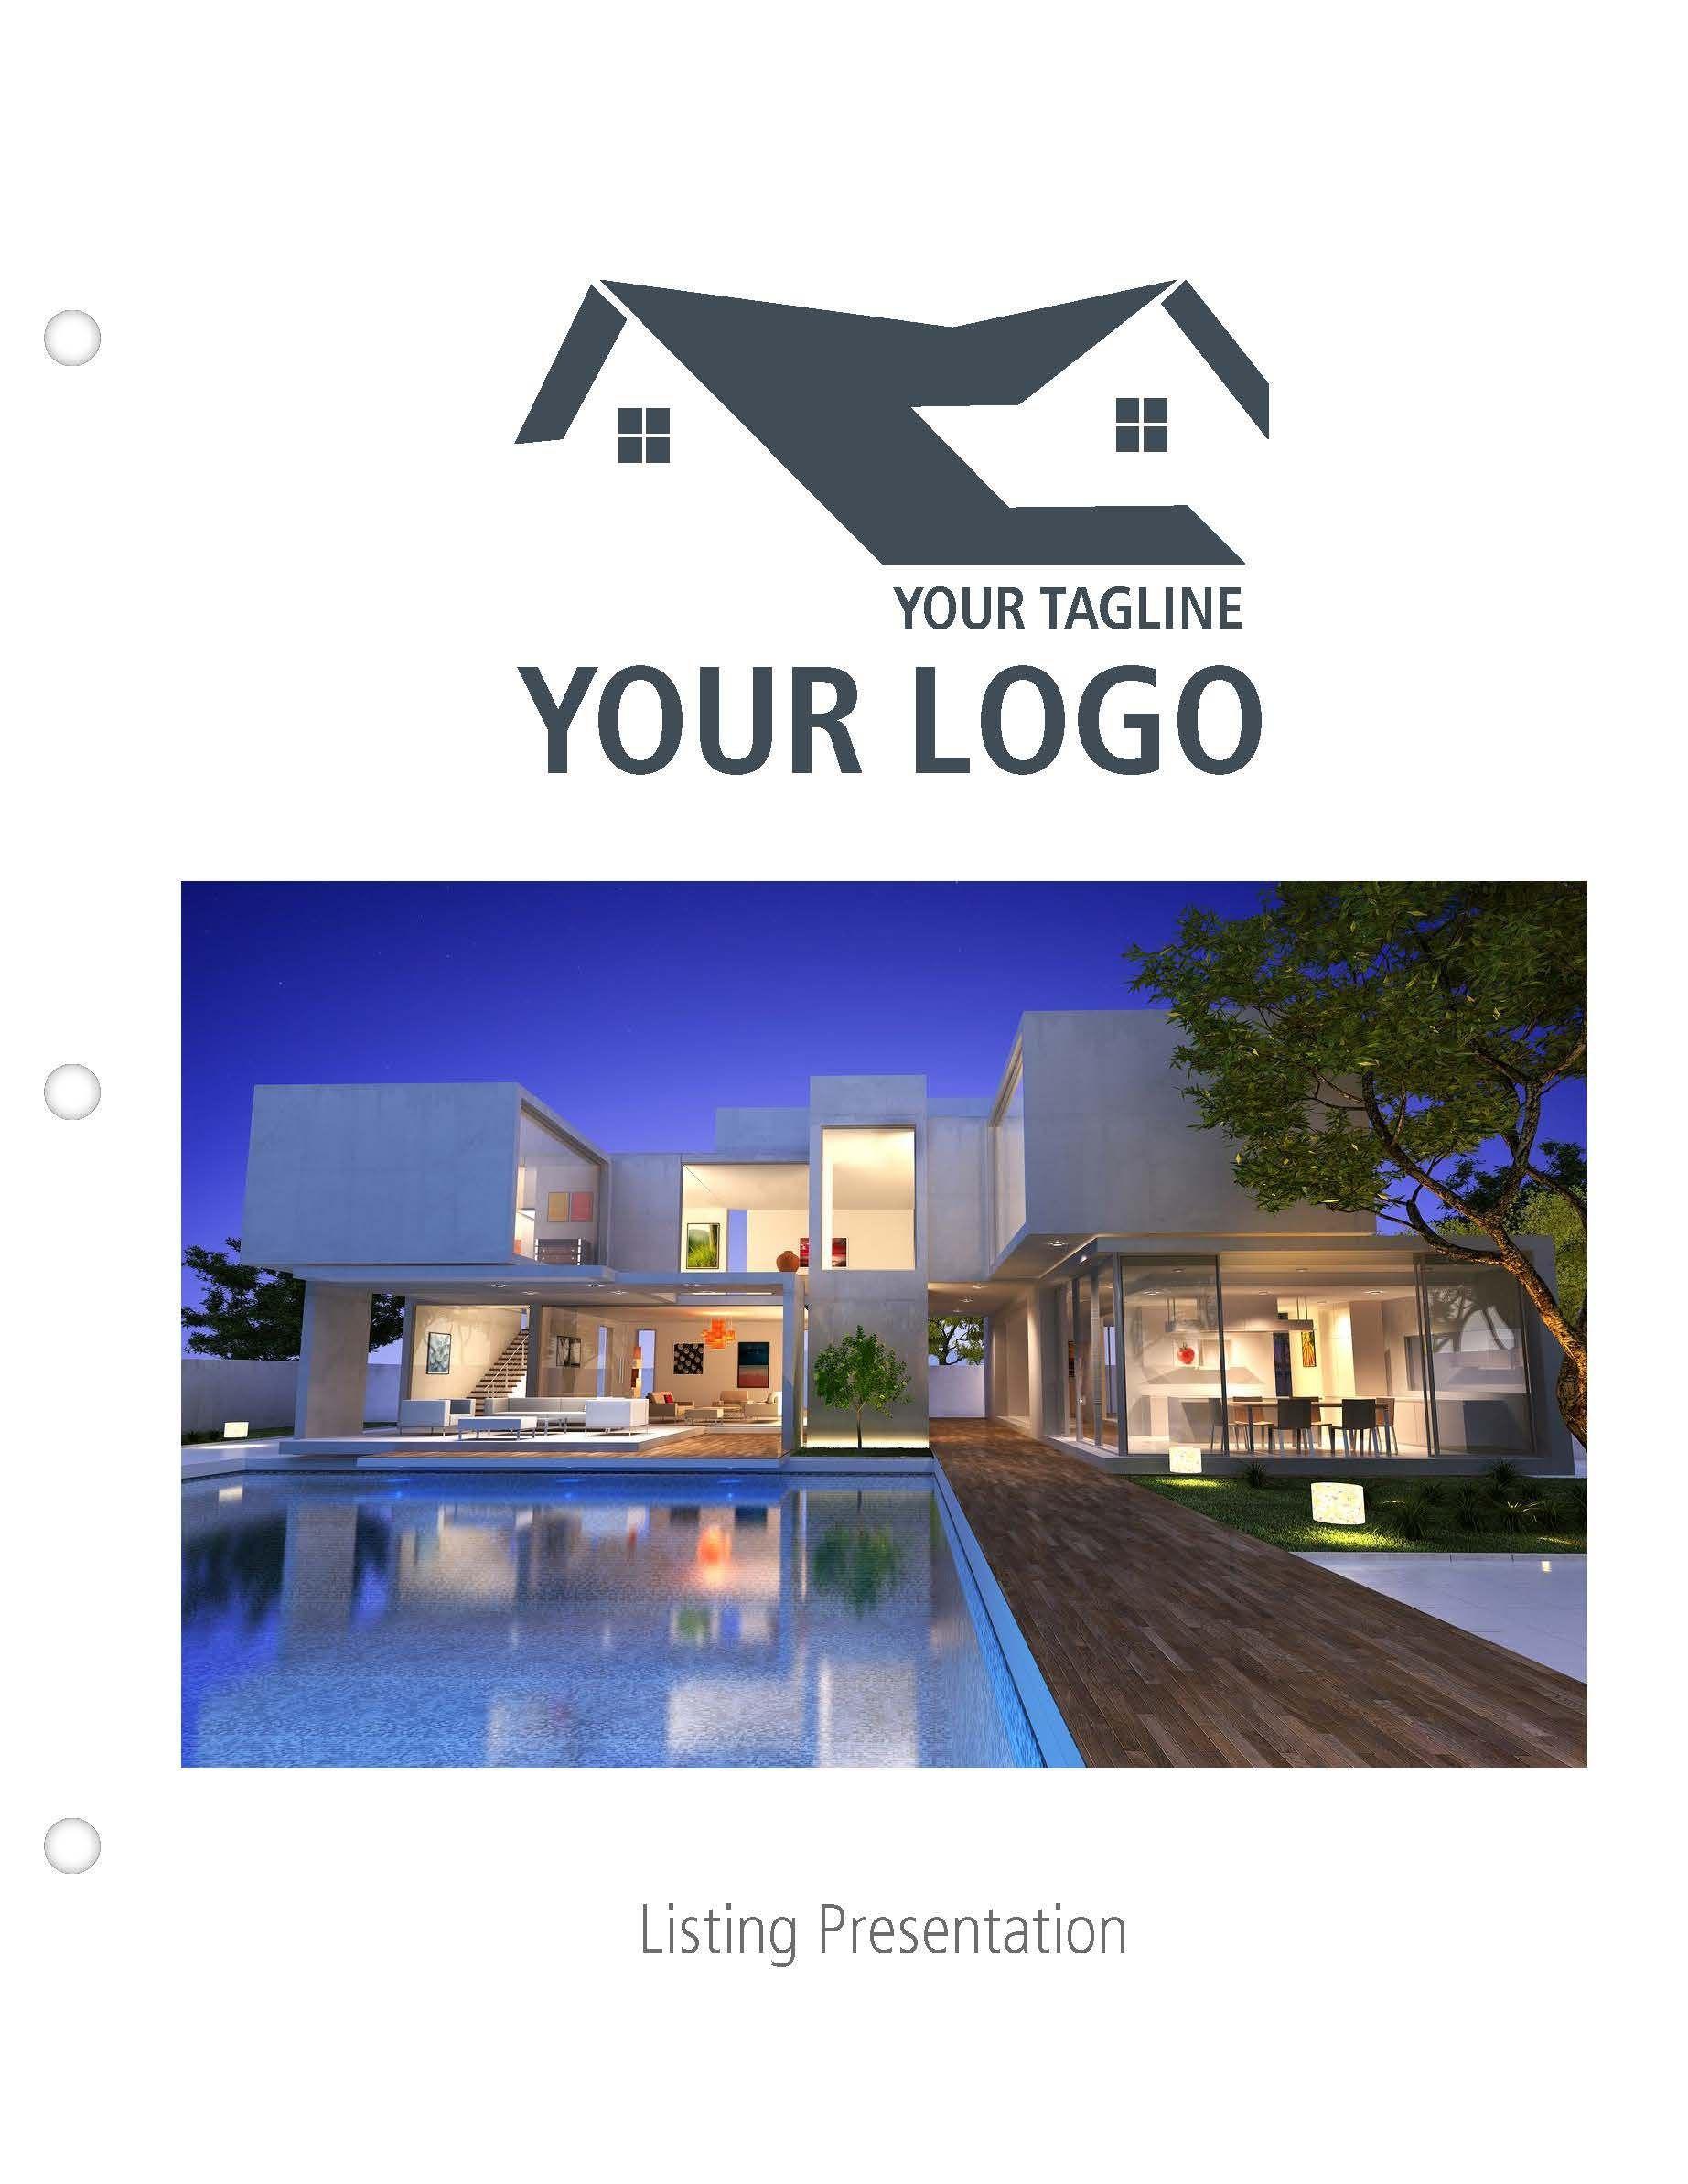 Realtor Listing Presentation Templatelimelight Marketing Within Real Estate Listing Presentation Template